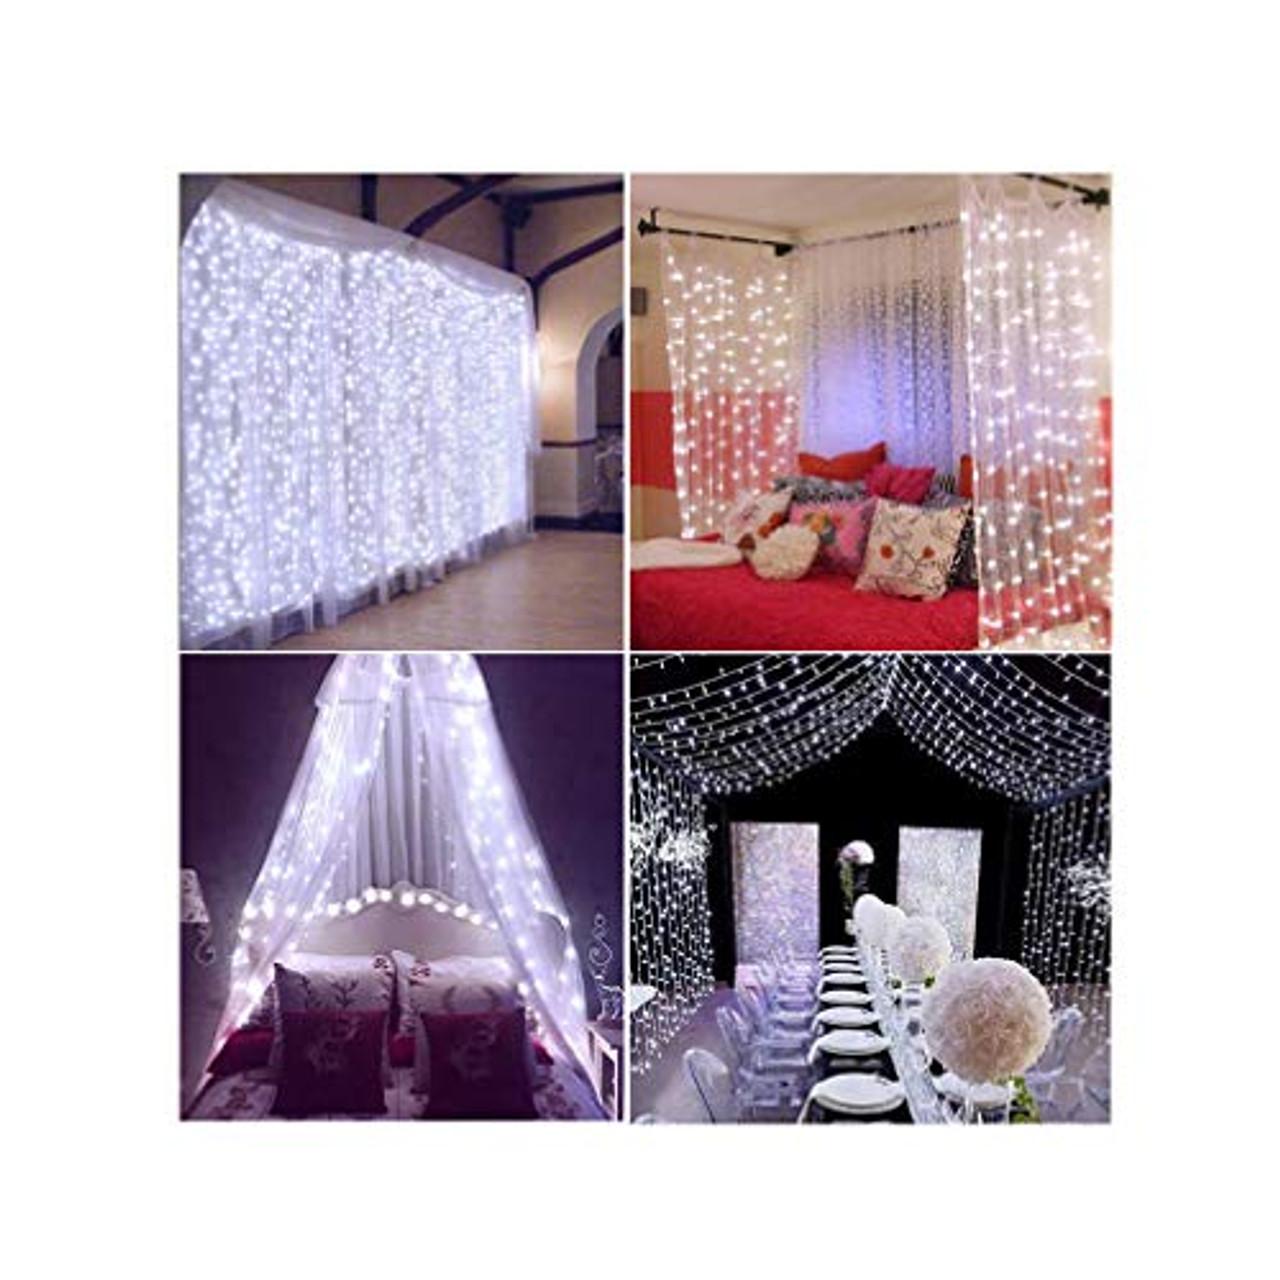 decute curtain lights 9 8 x 9 8ft 306 led ul listed christmas decoration fairy light for wedding bedroom bed canopy garden patio outdoor indoor